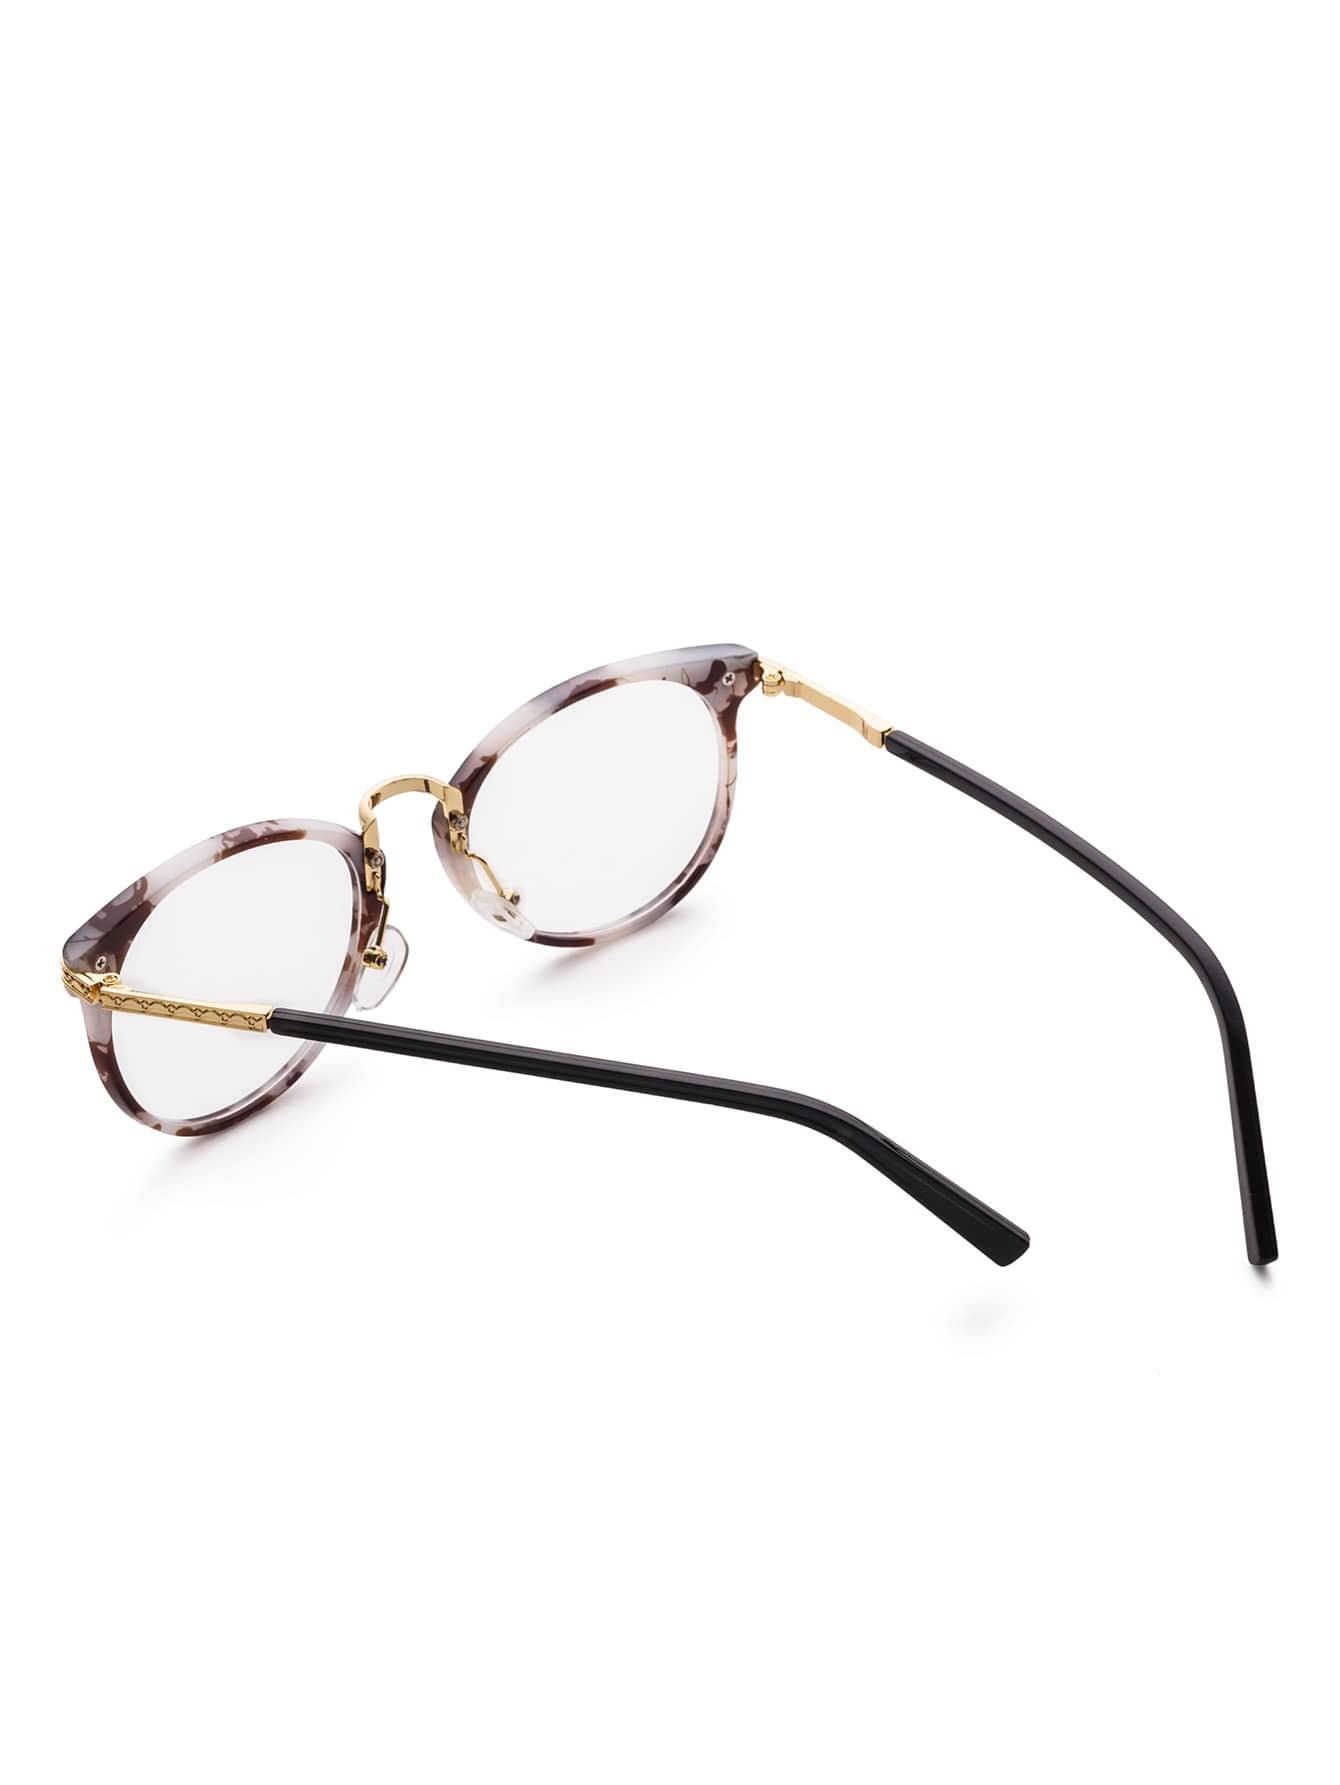 Marble Frame Metal Arm Clear Lens Glasses -SheIn(Sheinside)